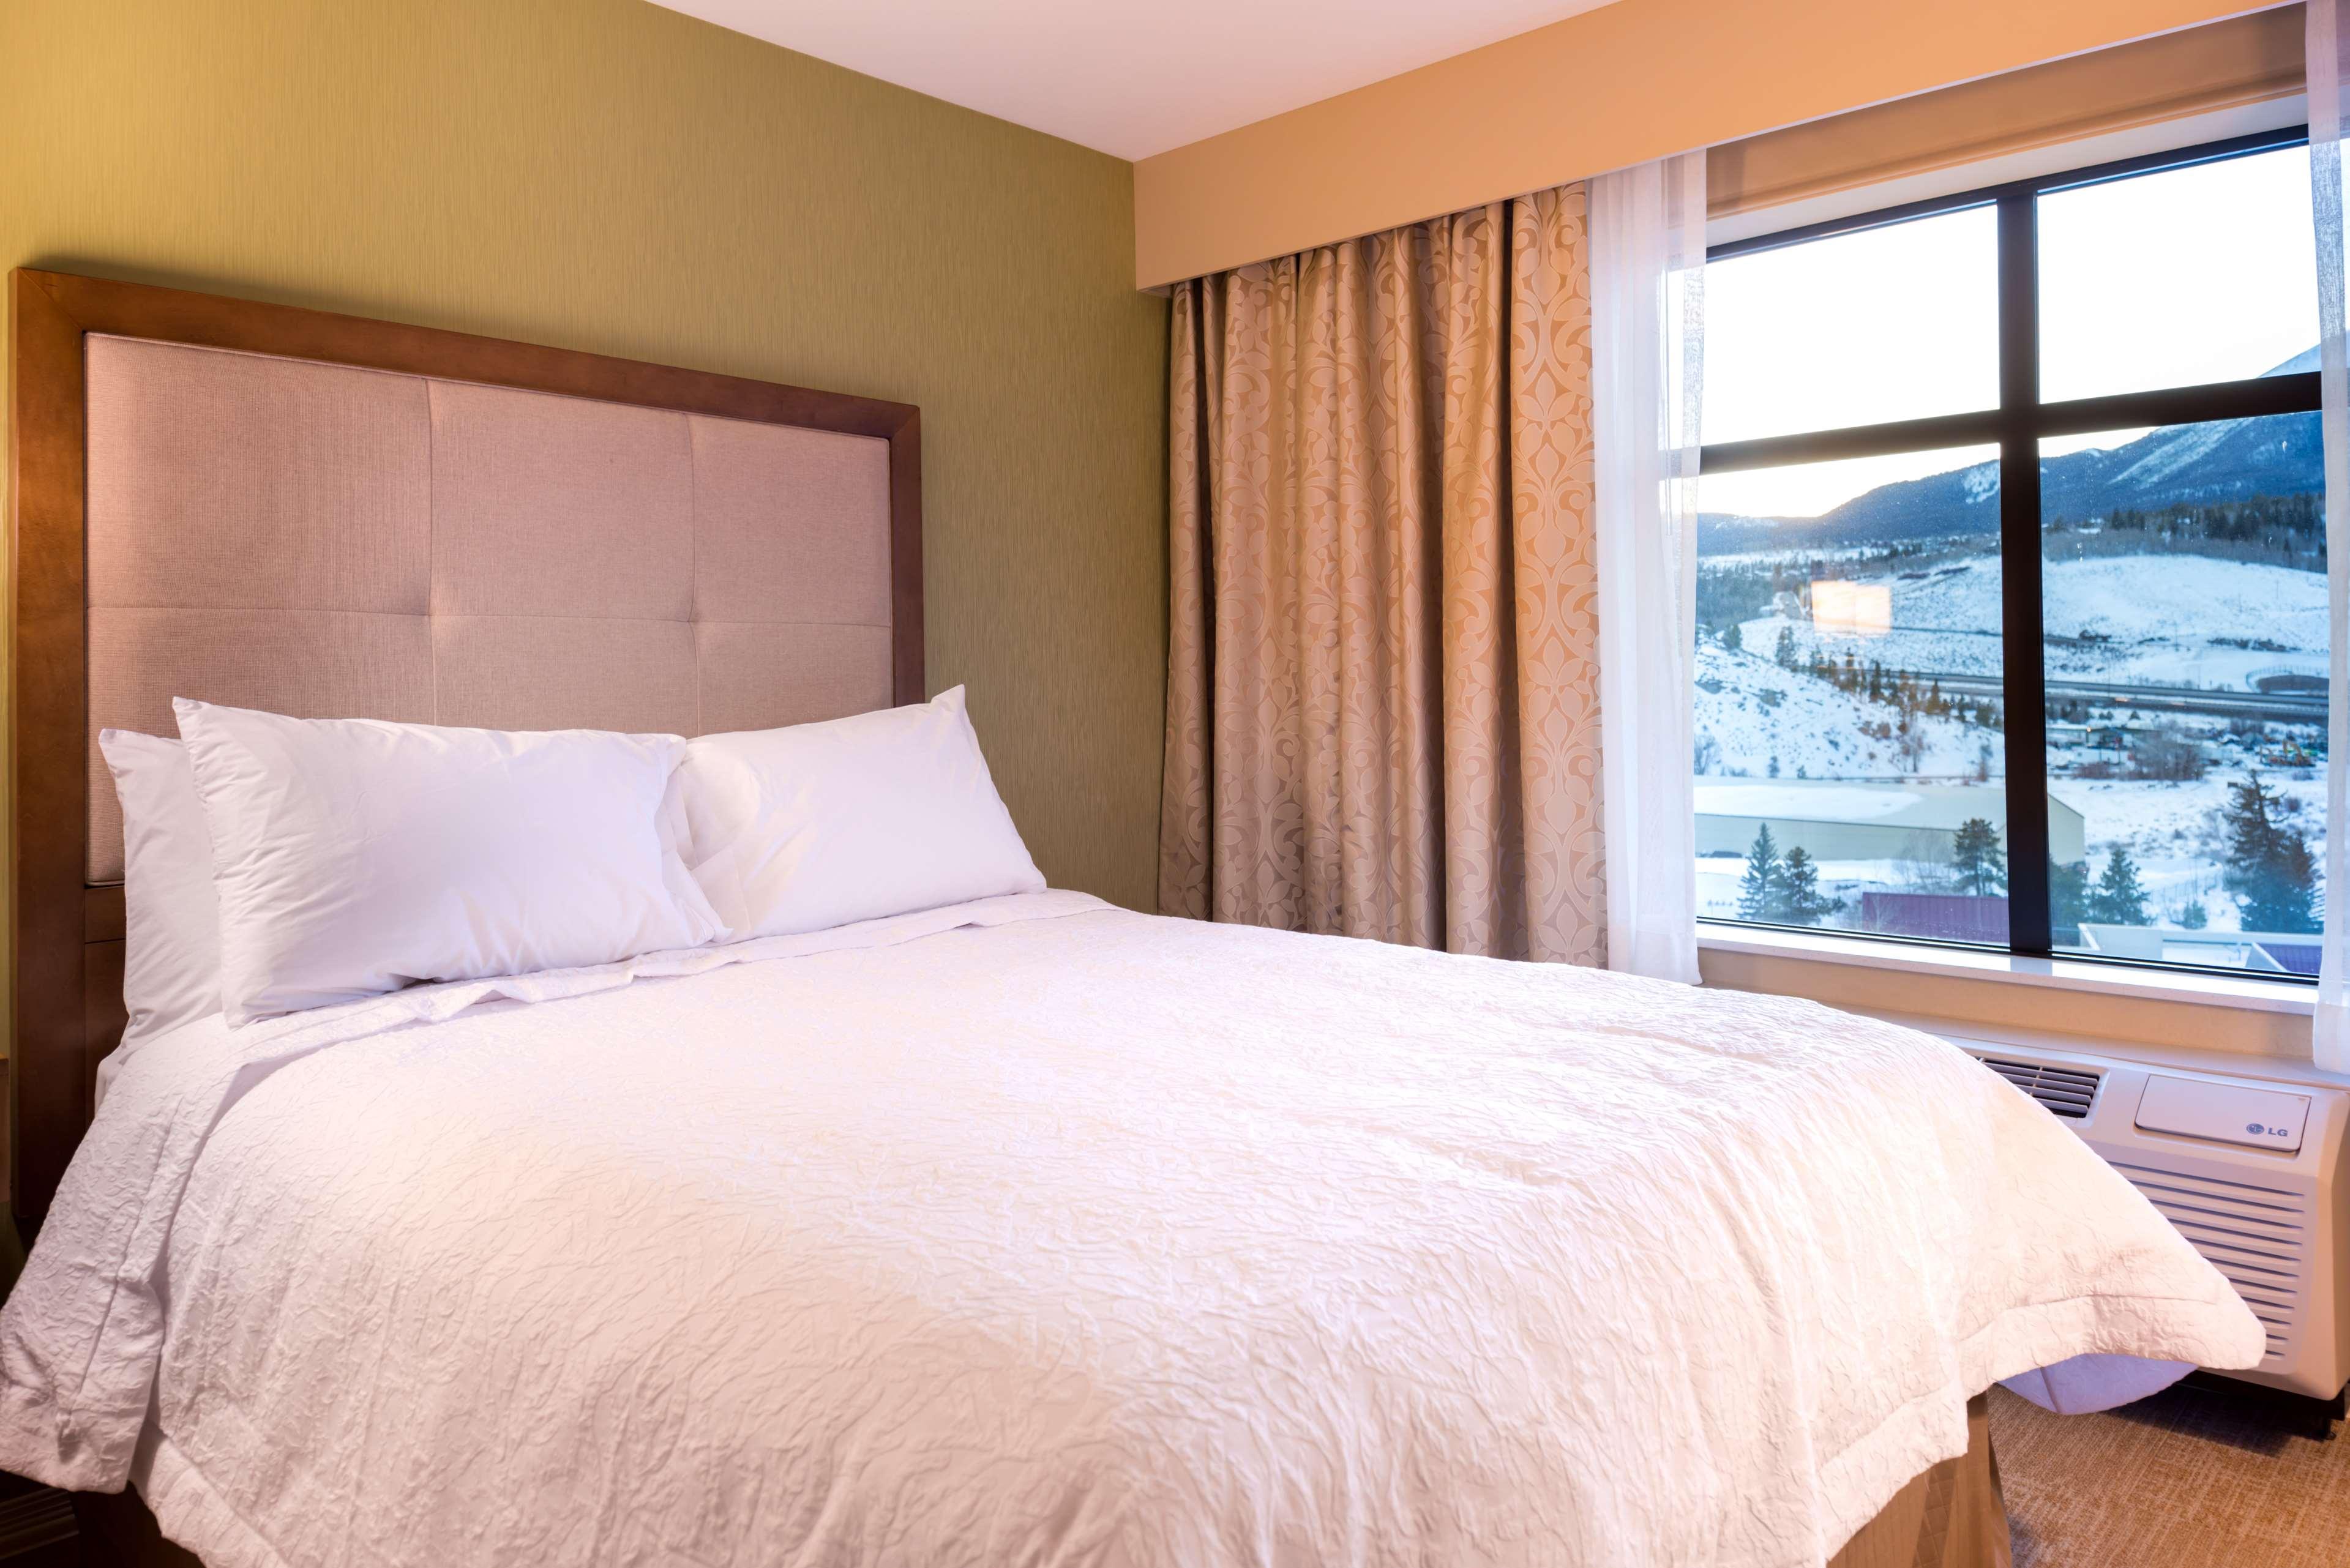 Hampton Inn & Suites Silverthorne image 18